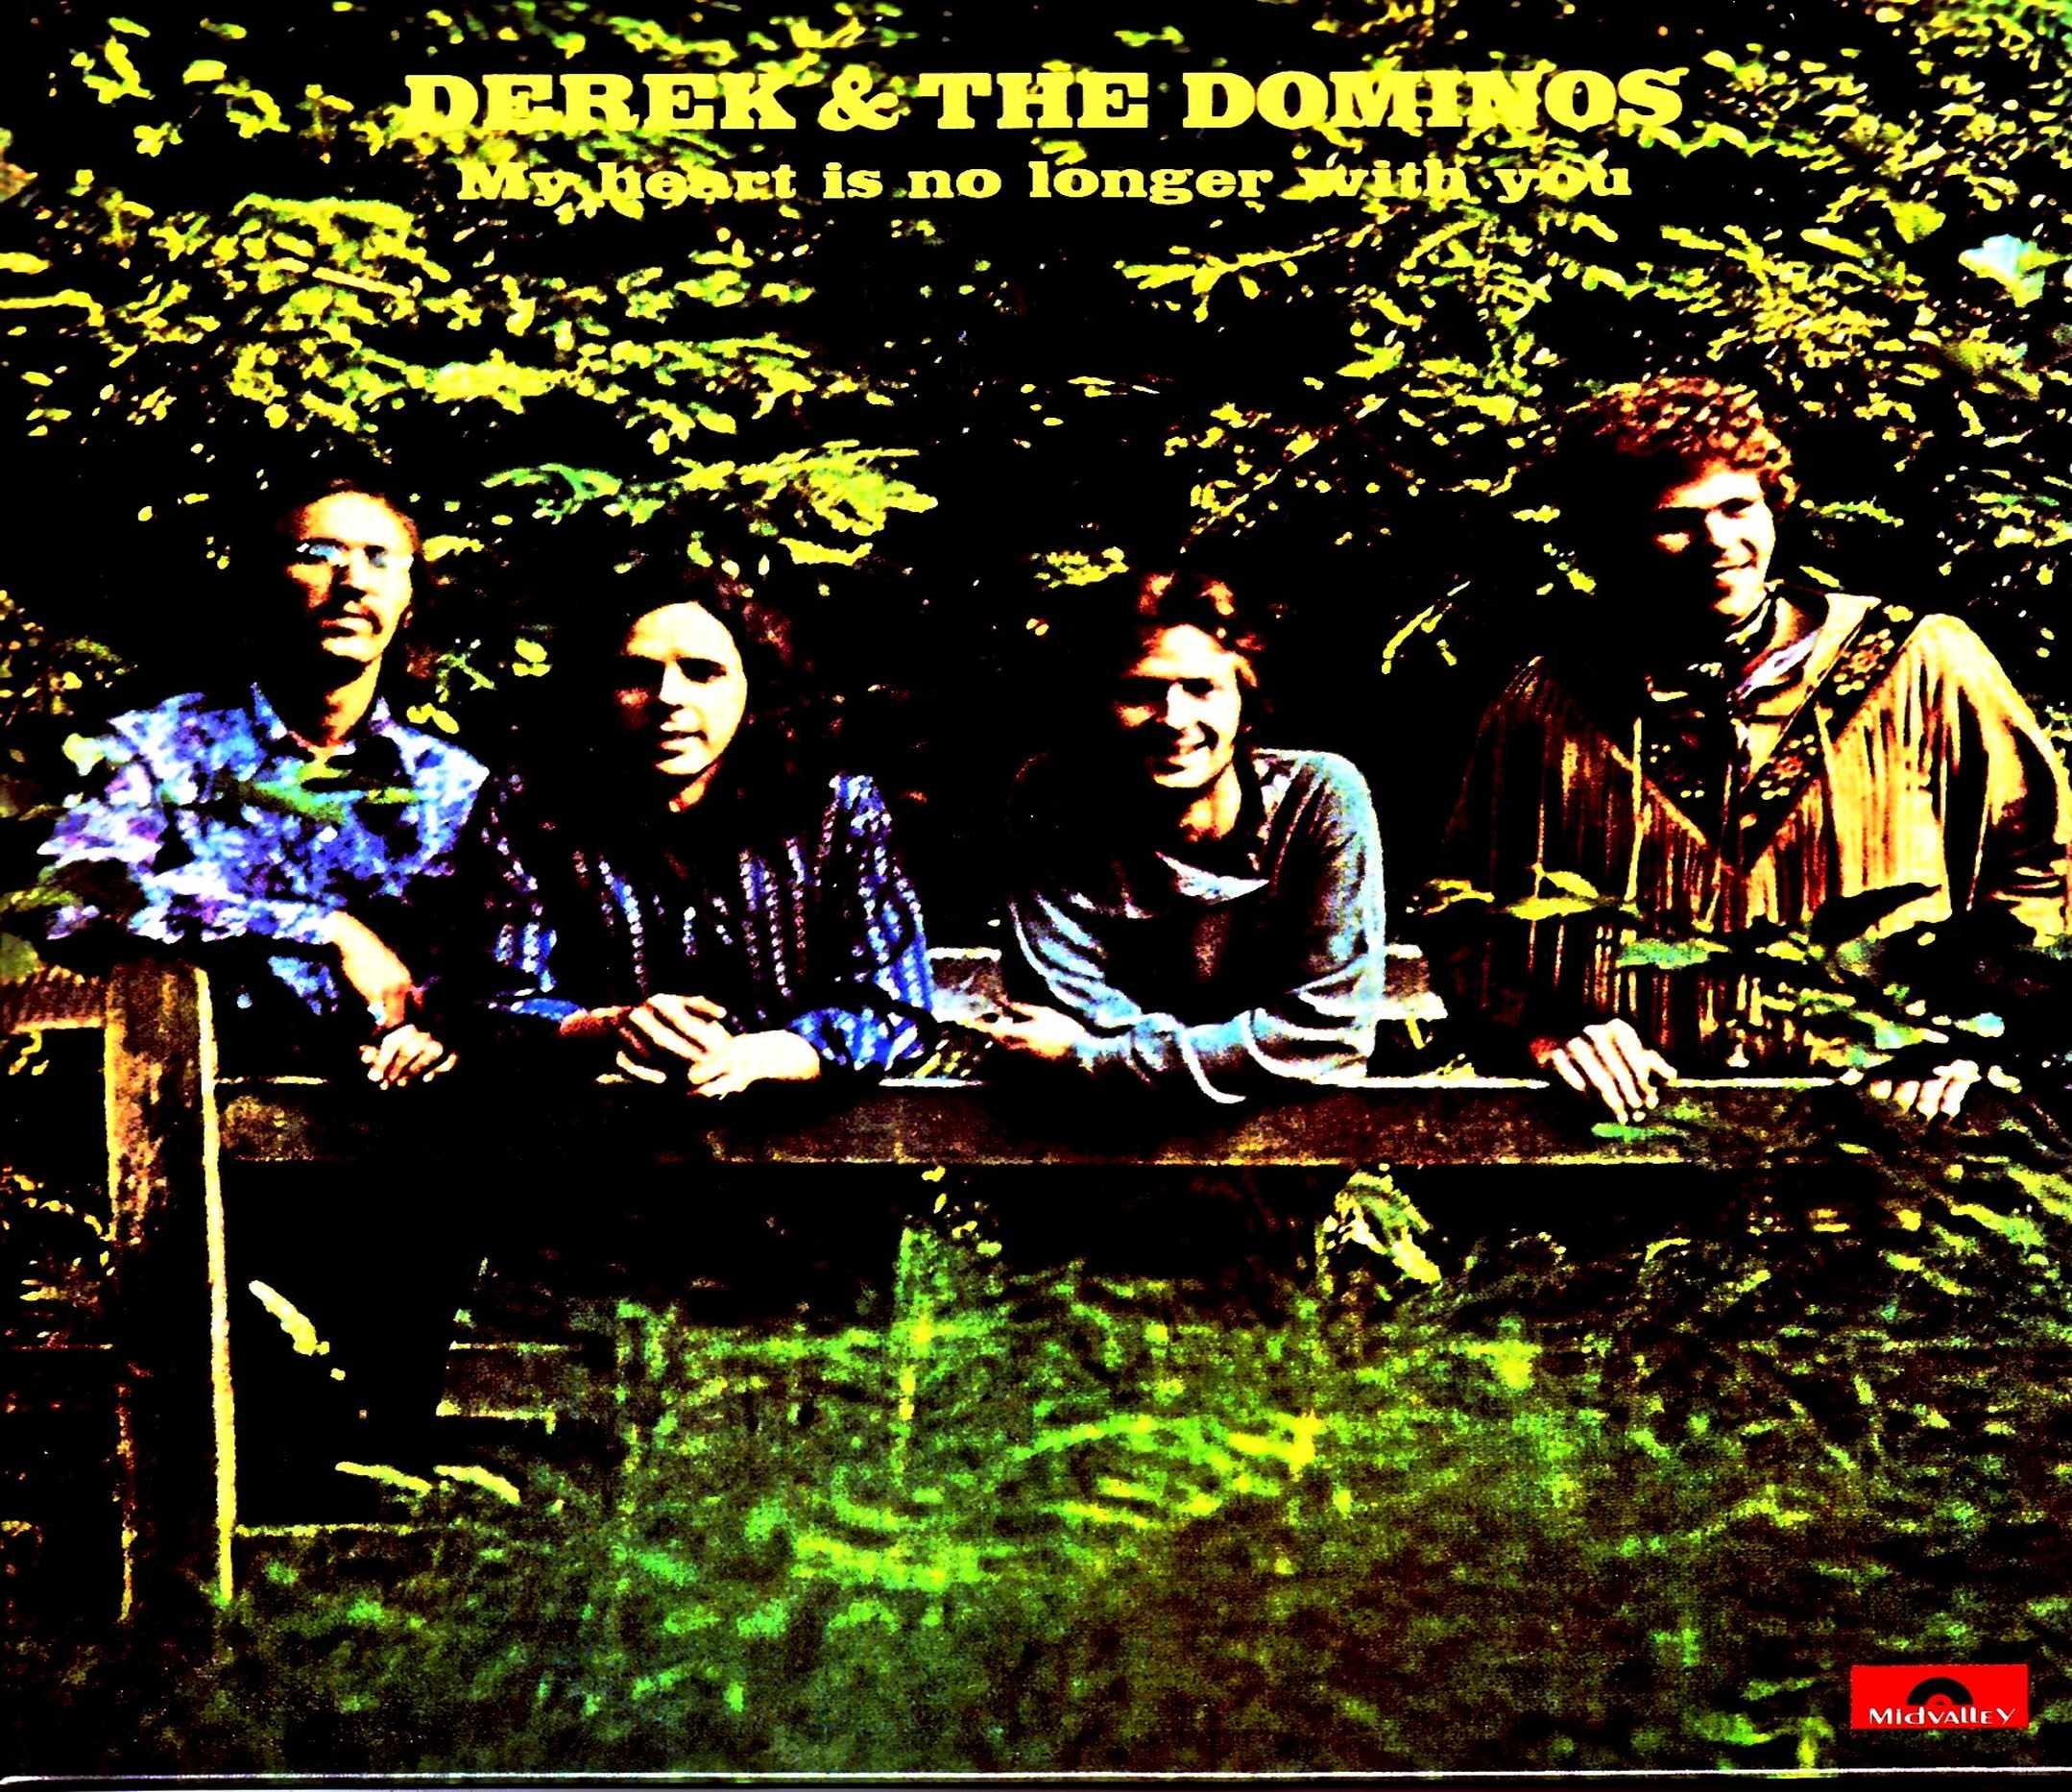 Derek & the Dominos デレク・アンド・ザ・ドミノス/幻のセカンド・アルバム・セッションの集大成 Sessions for 2nd Album